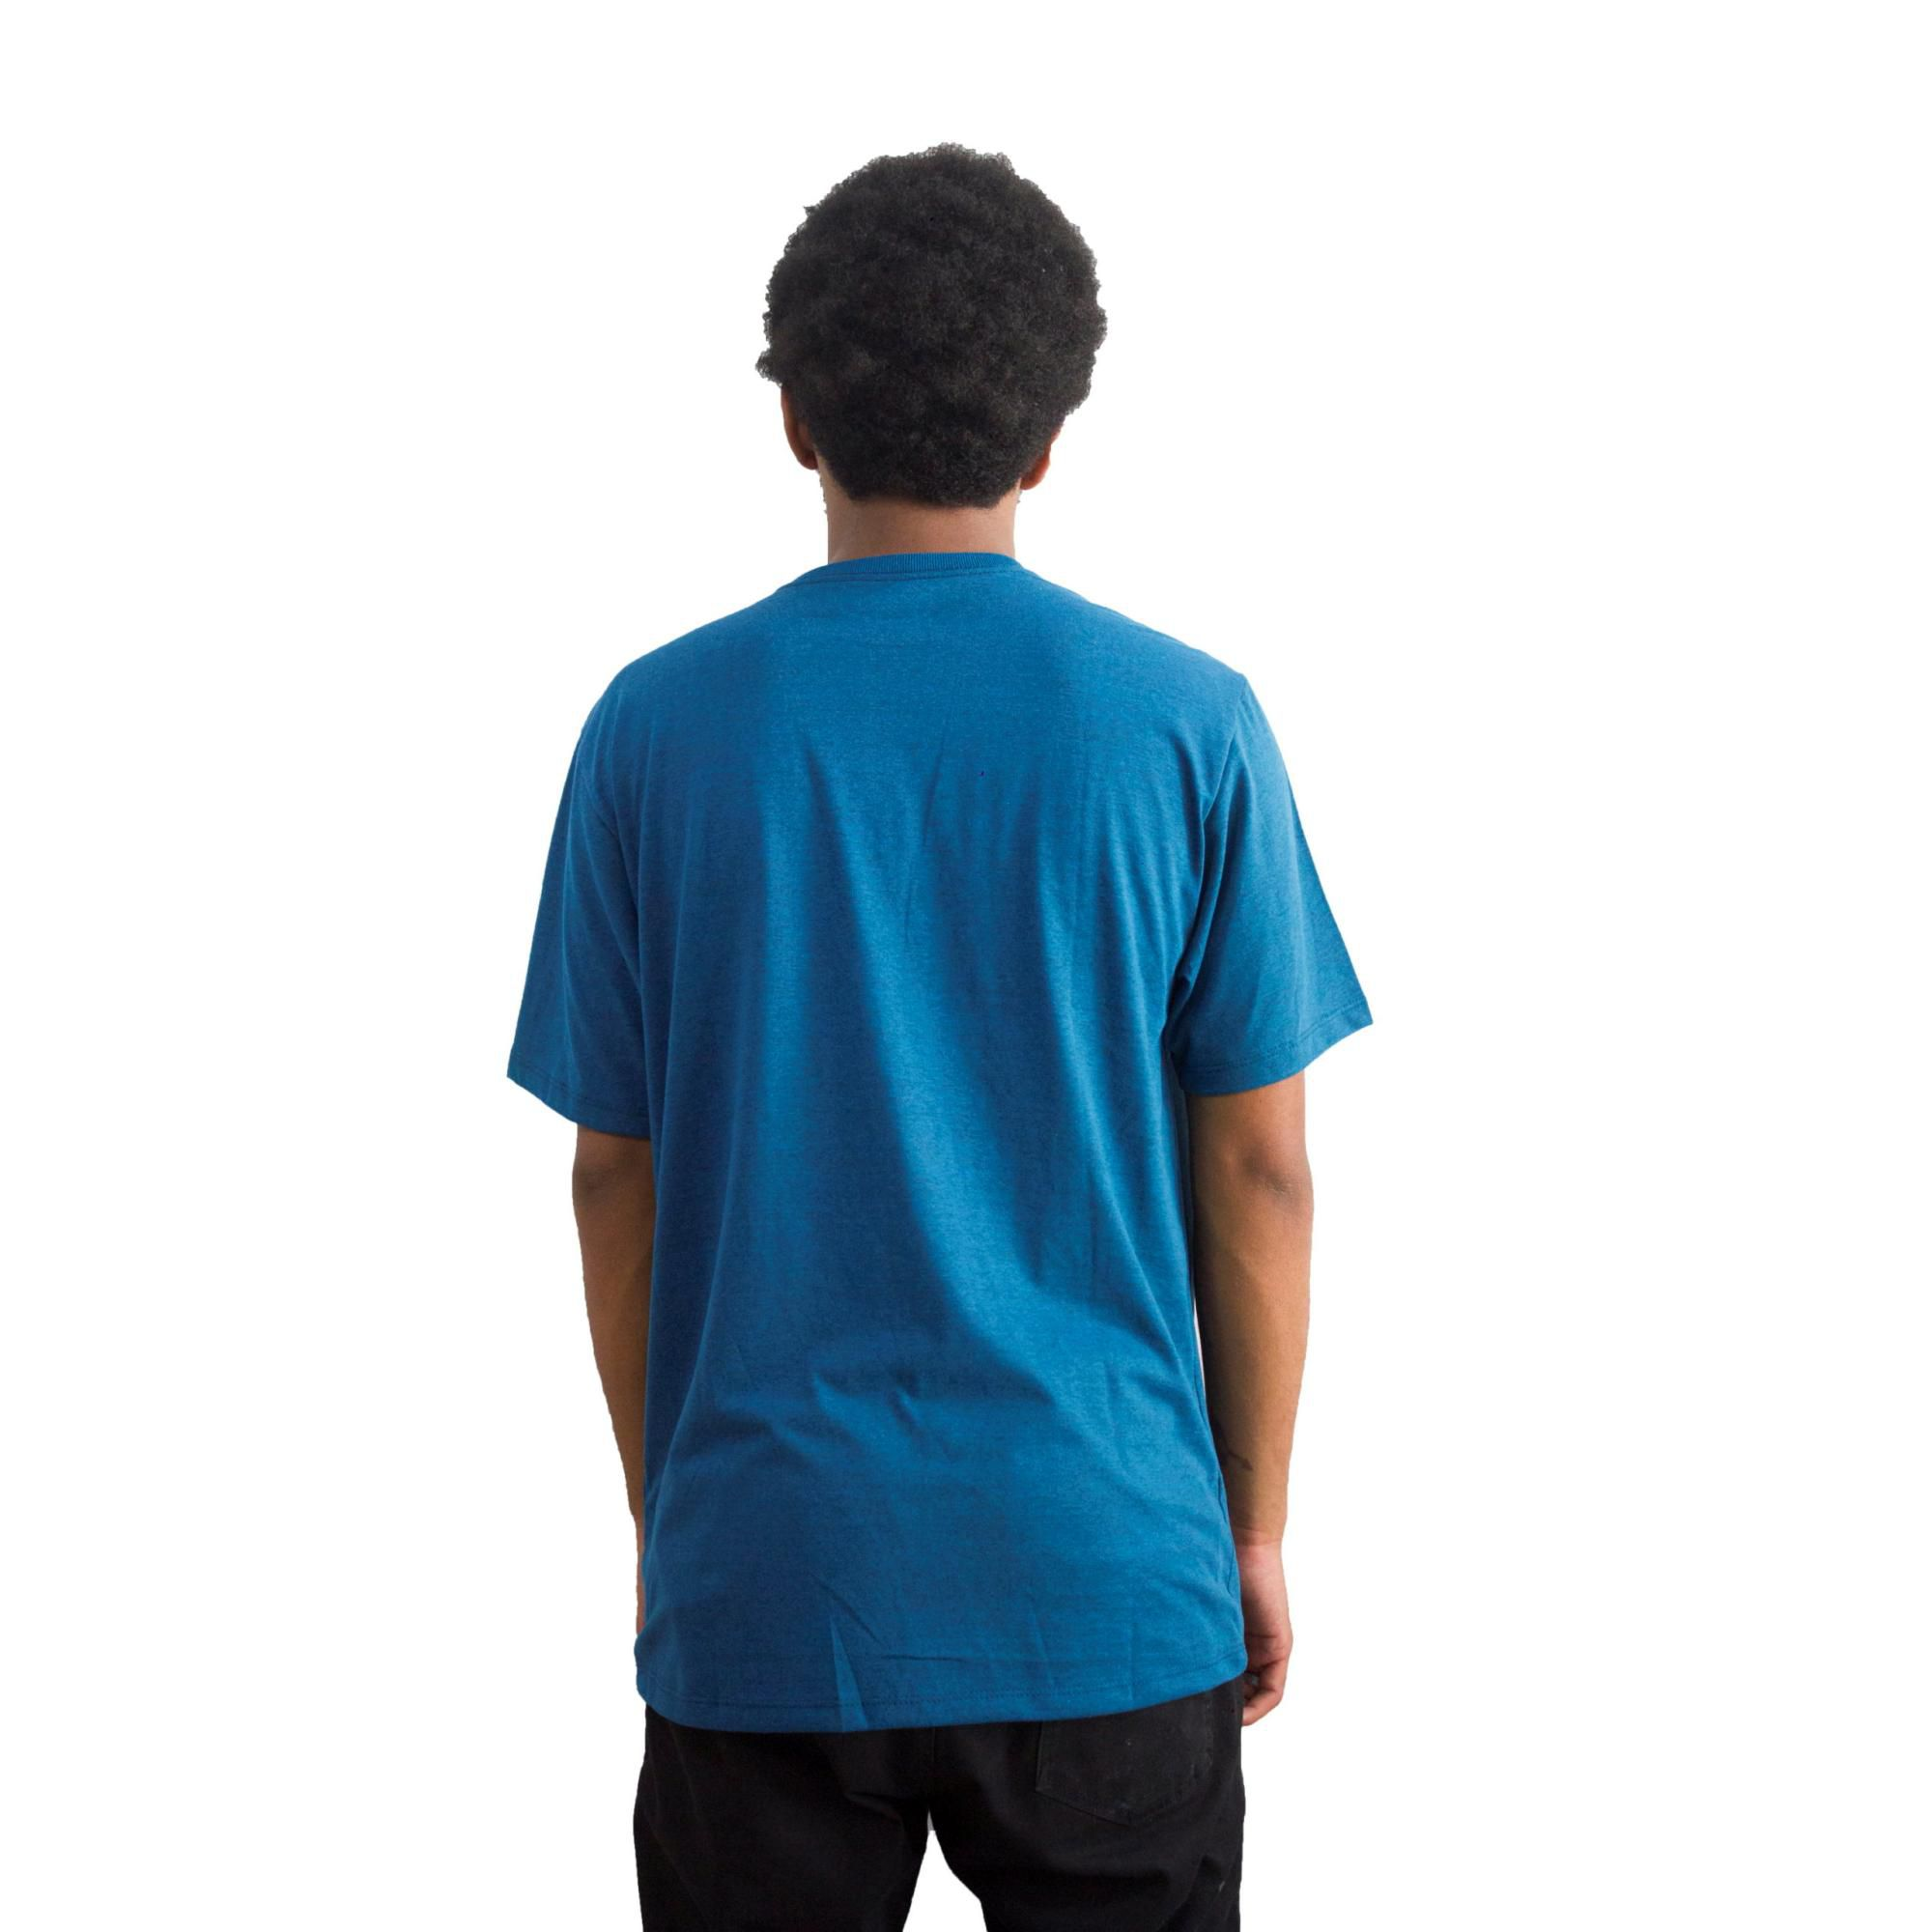 Camiseta Hurley mini Icon marinho mescla